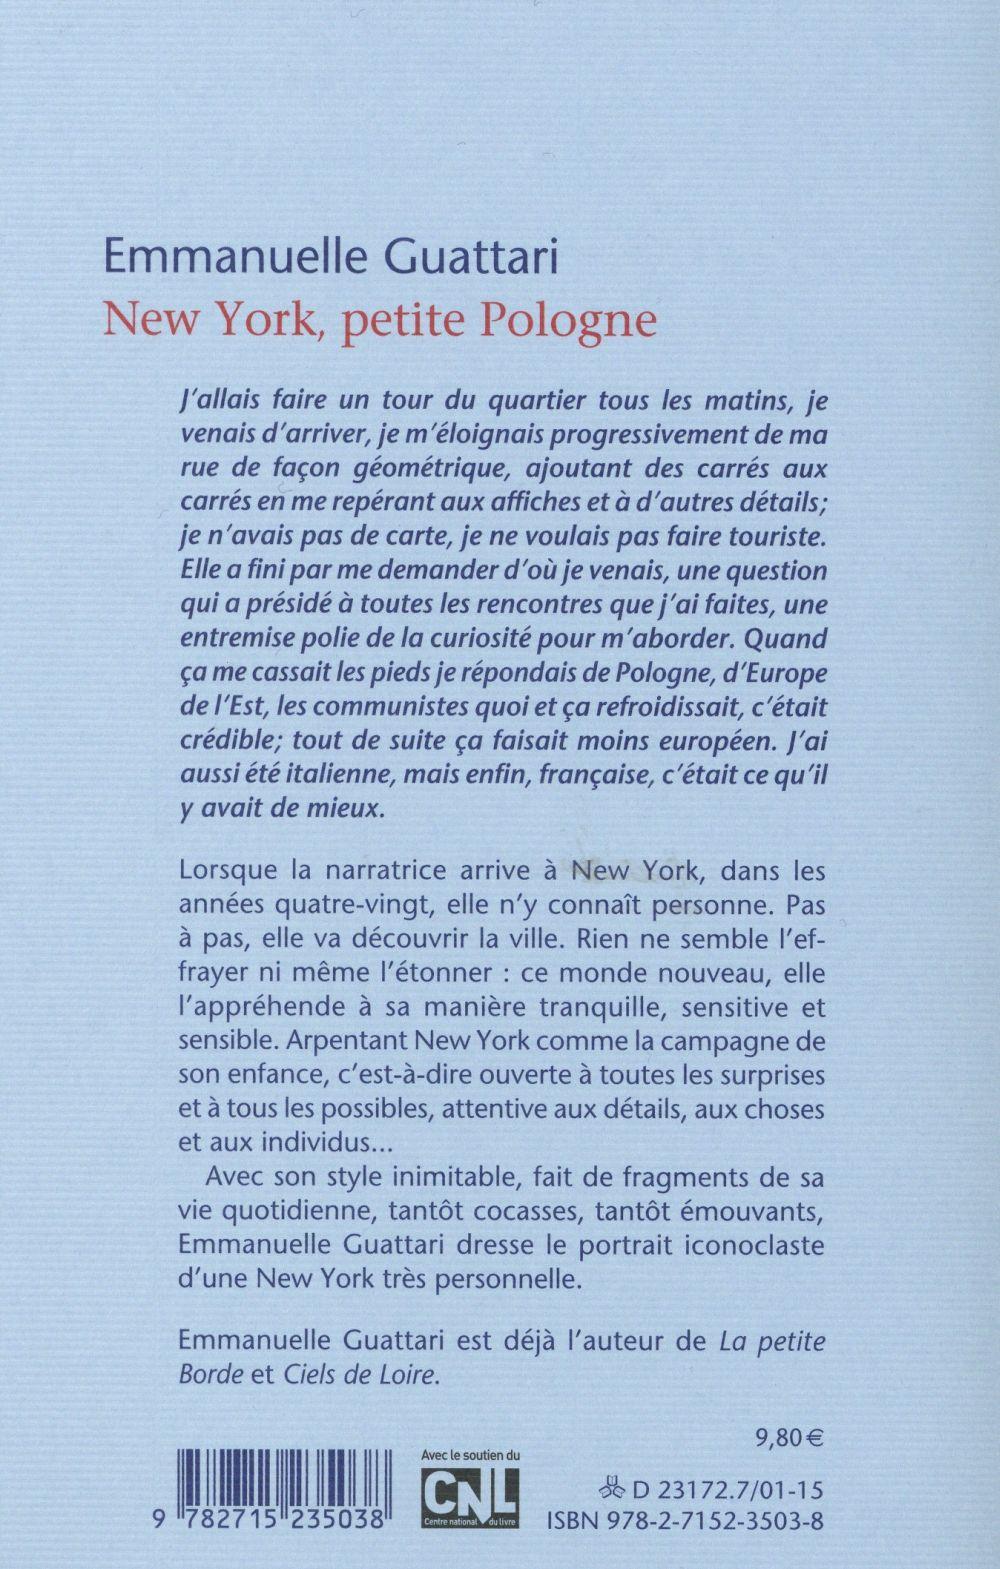 New York, petite Pologne